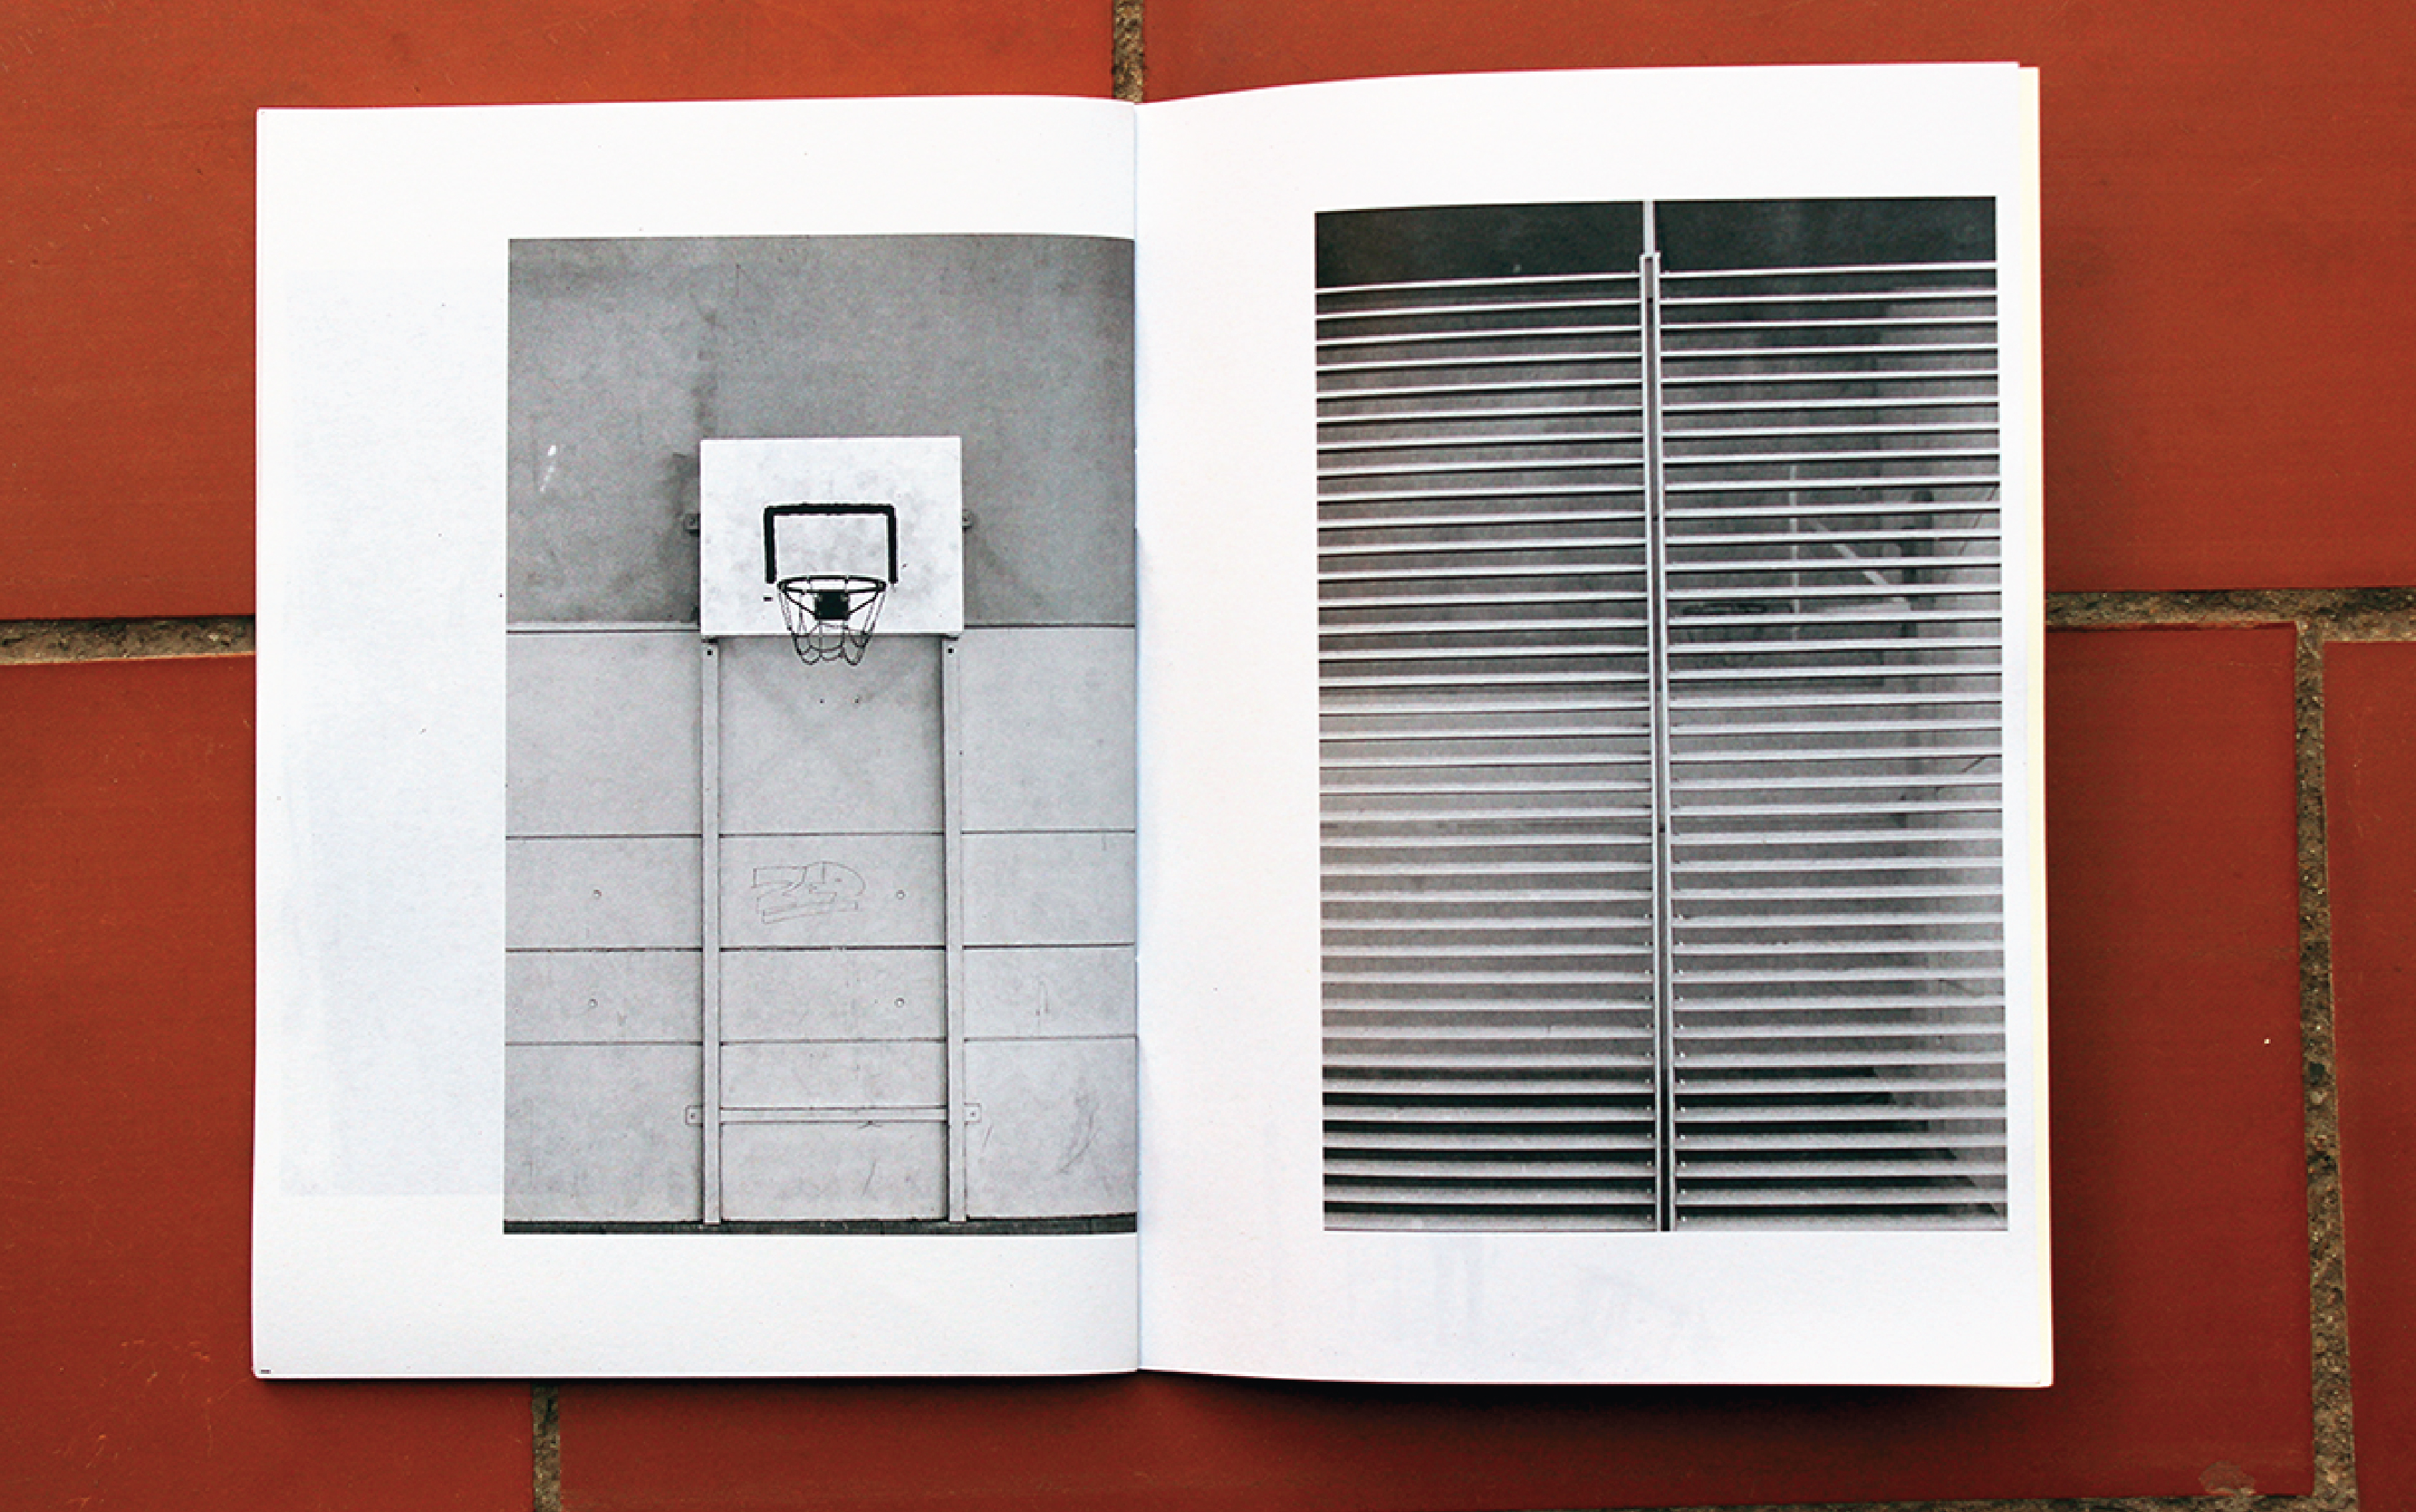 Strasbourg 2014 Livret Photo Terrain de Basket